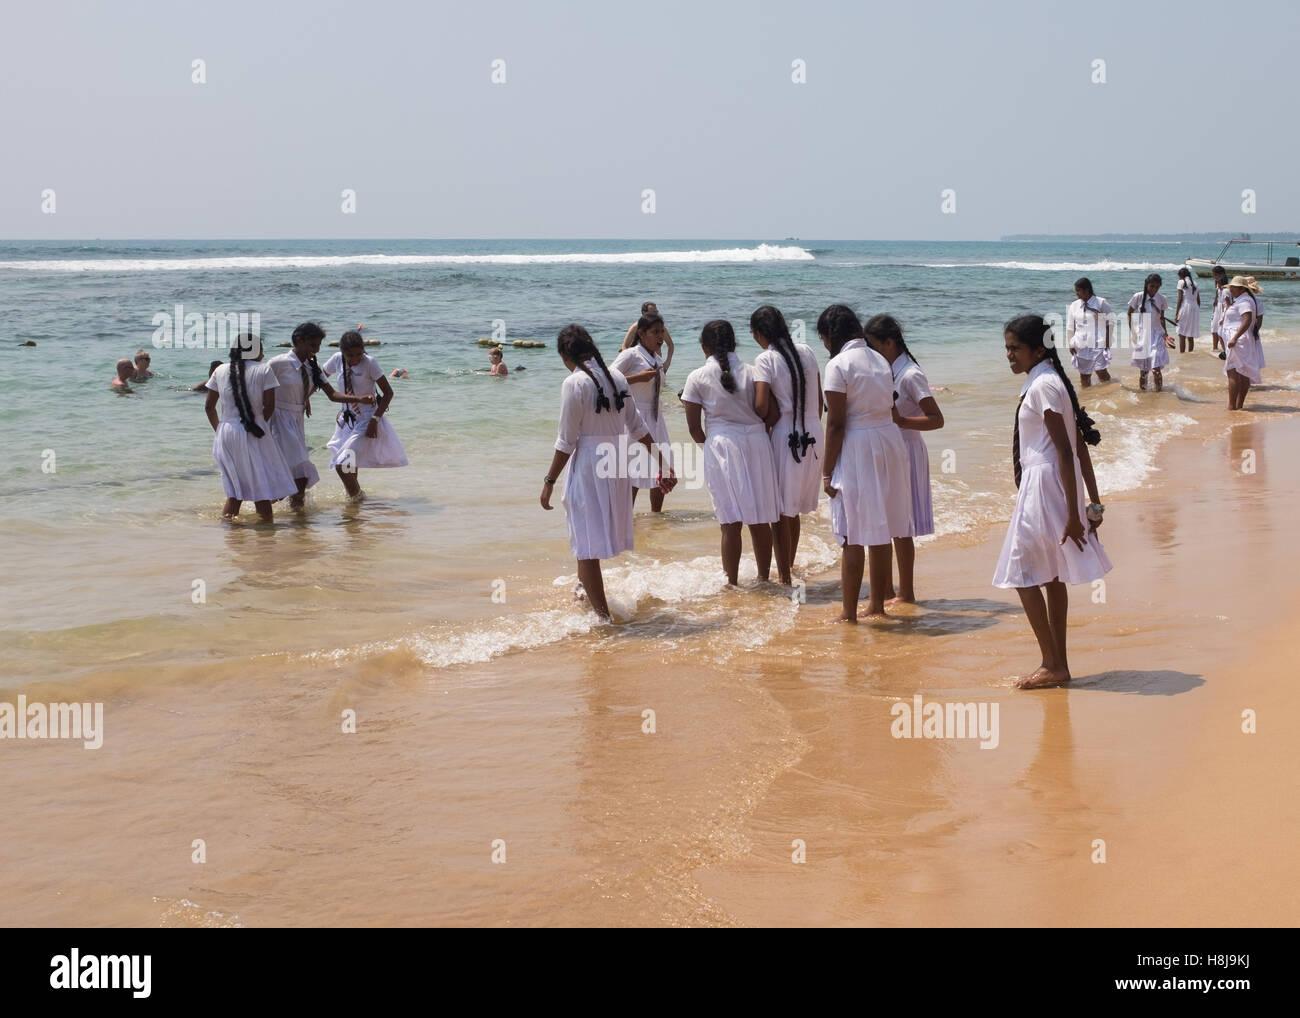 Schoolchildren playing on a beach in Sri Lanka - Stock Image